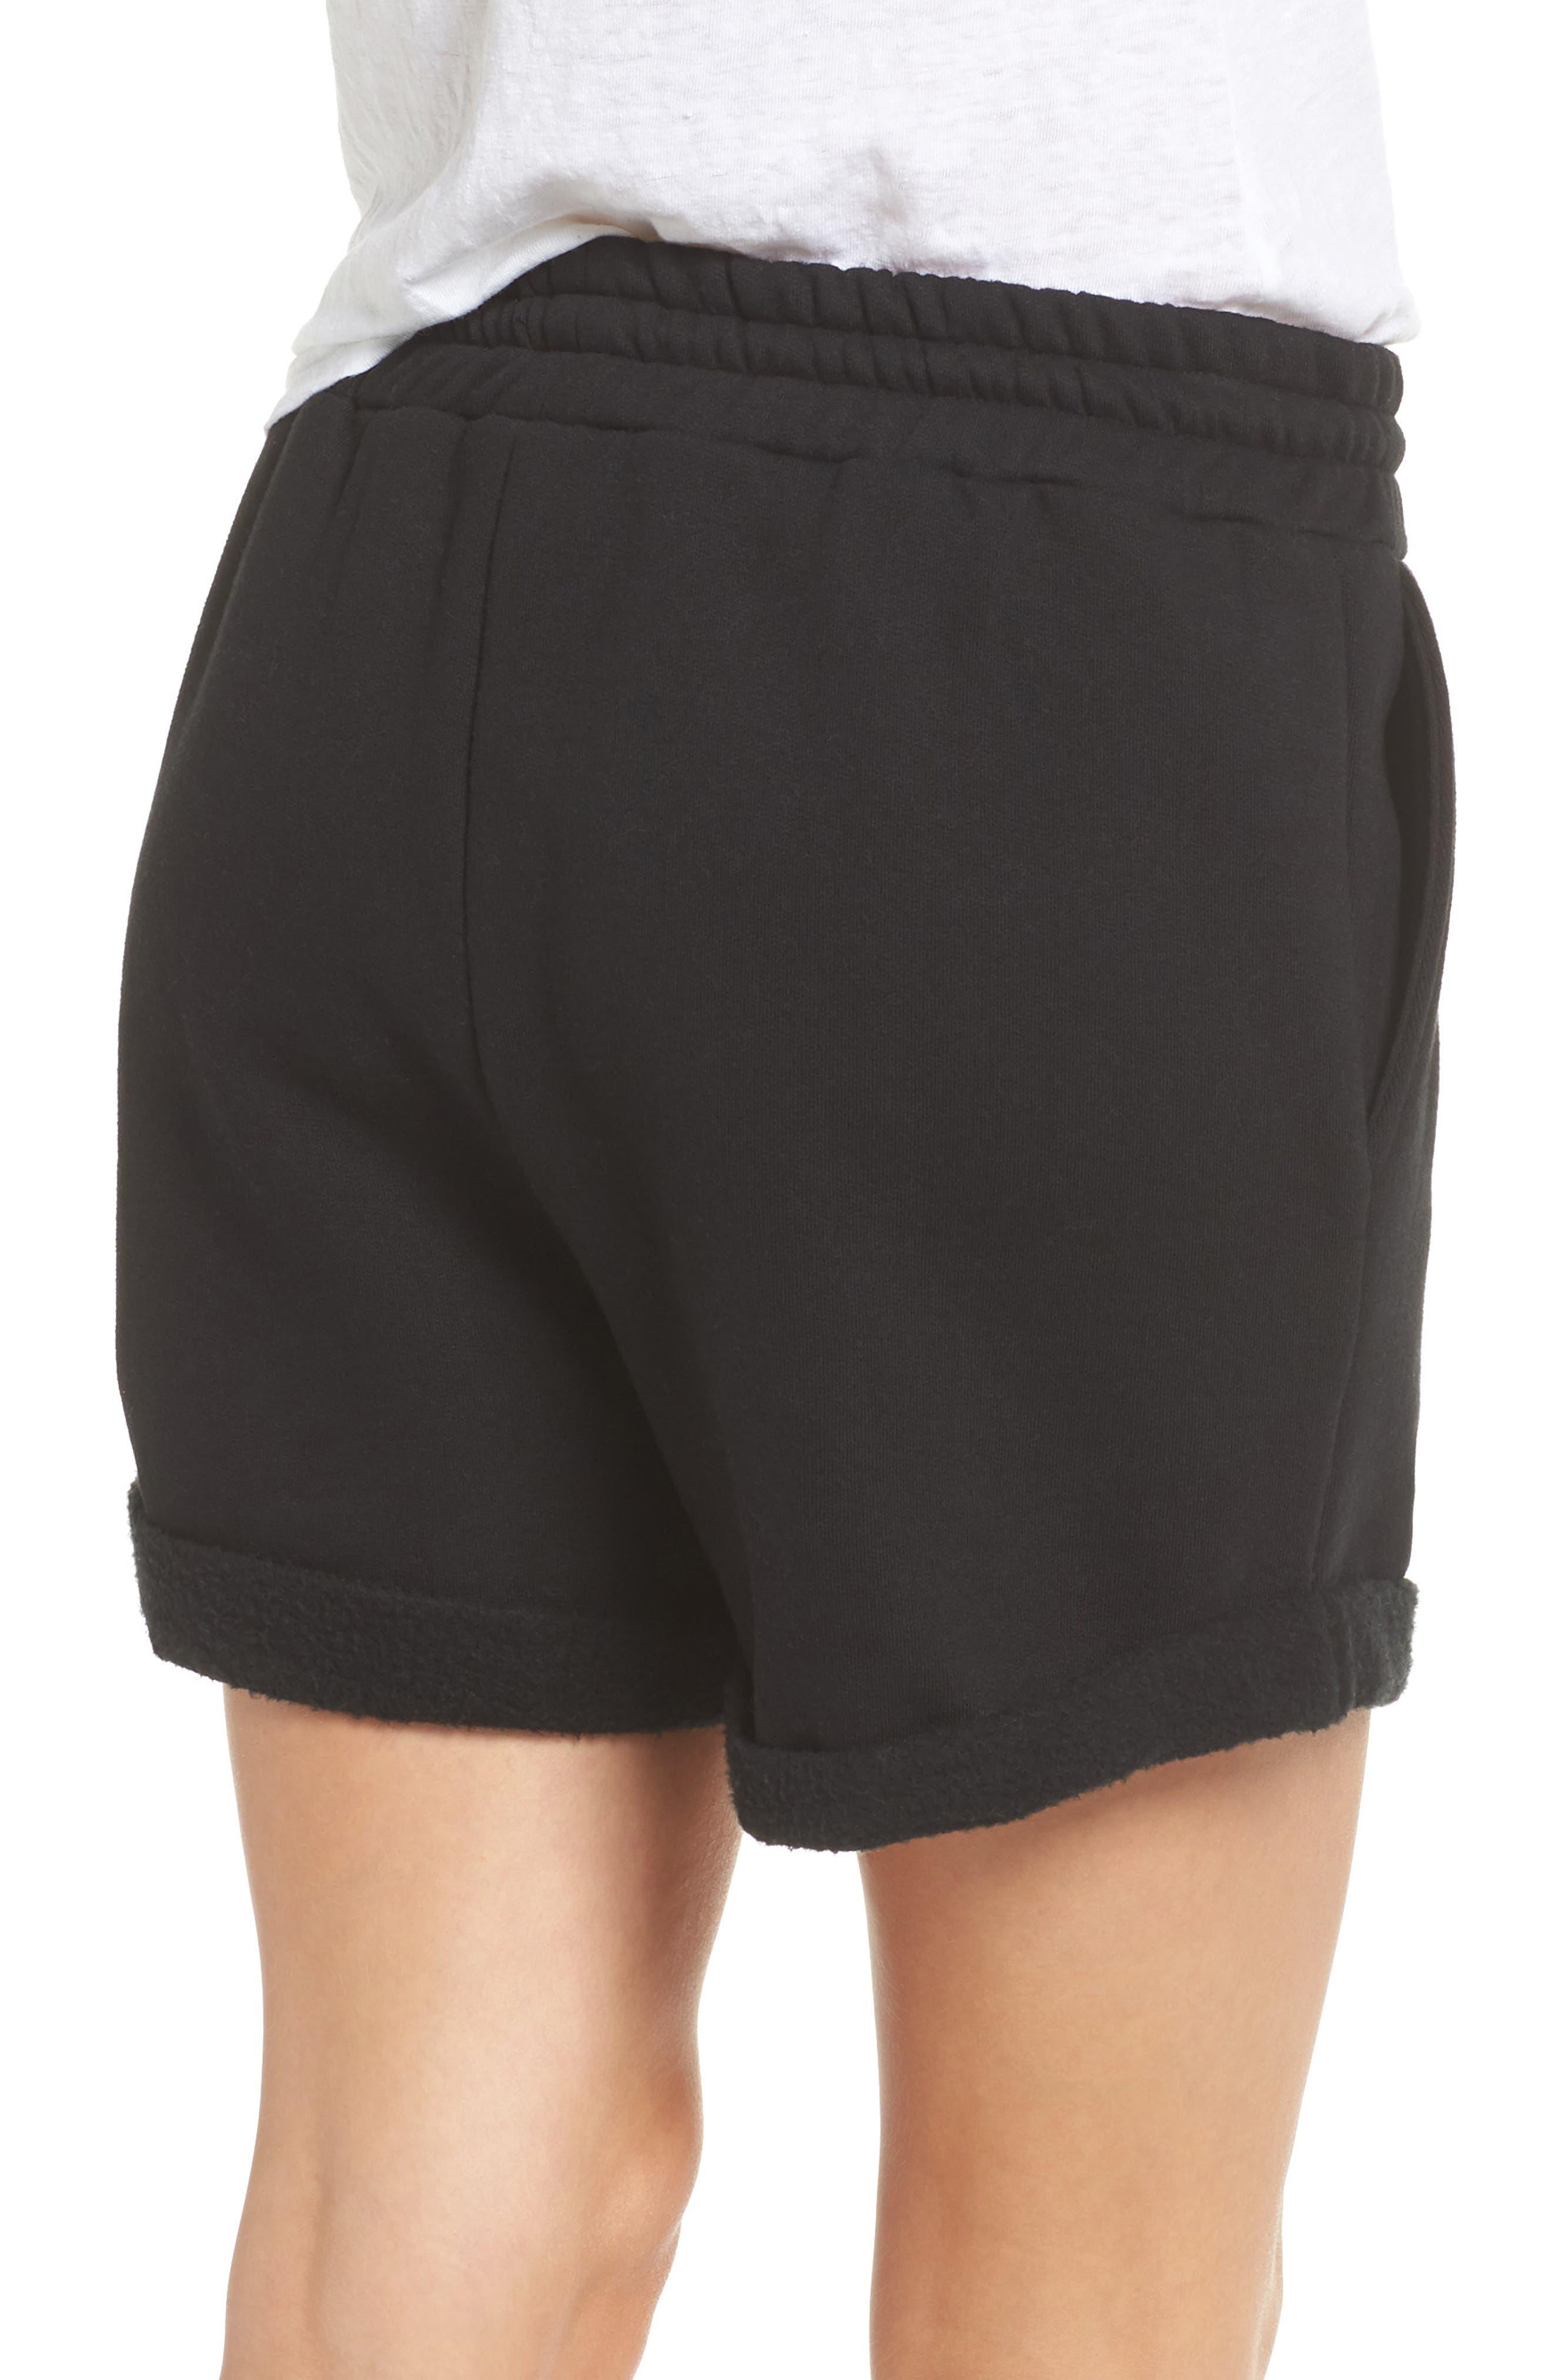 Blonde Lounge Shorts,                             Alternate thumbnail 2, color,                             Black